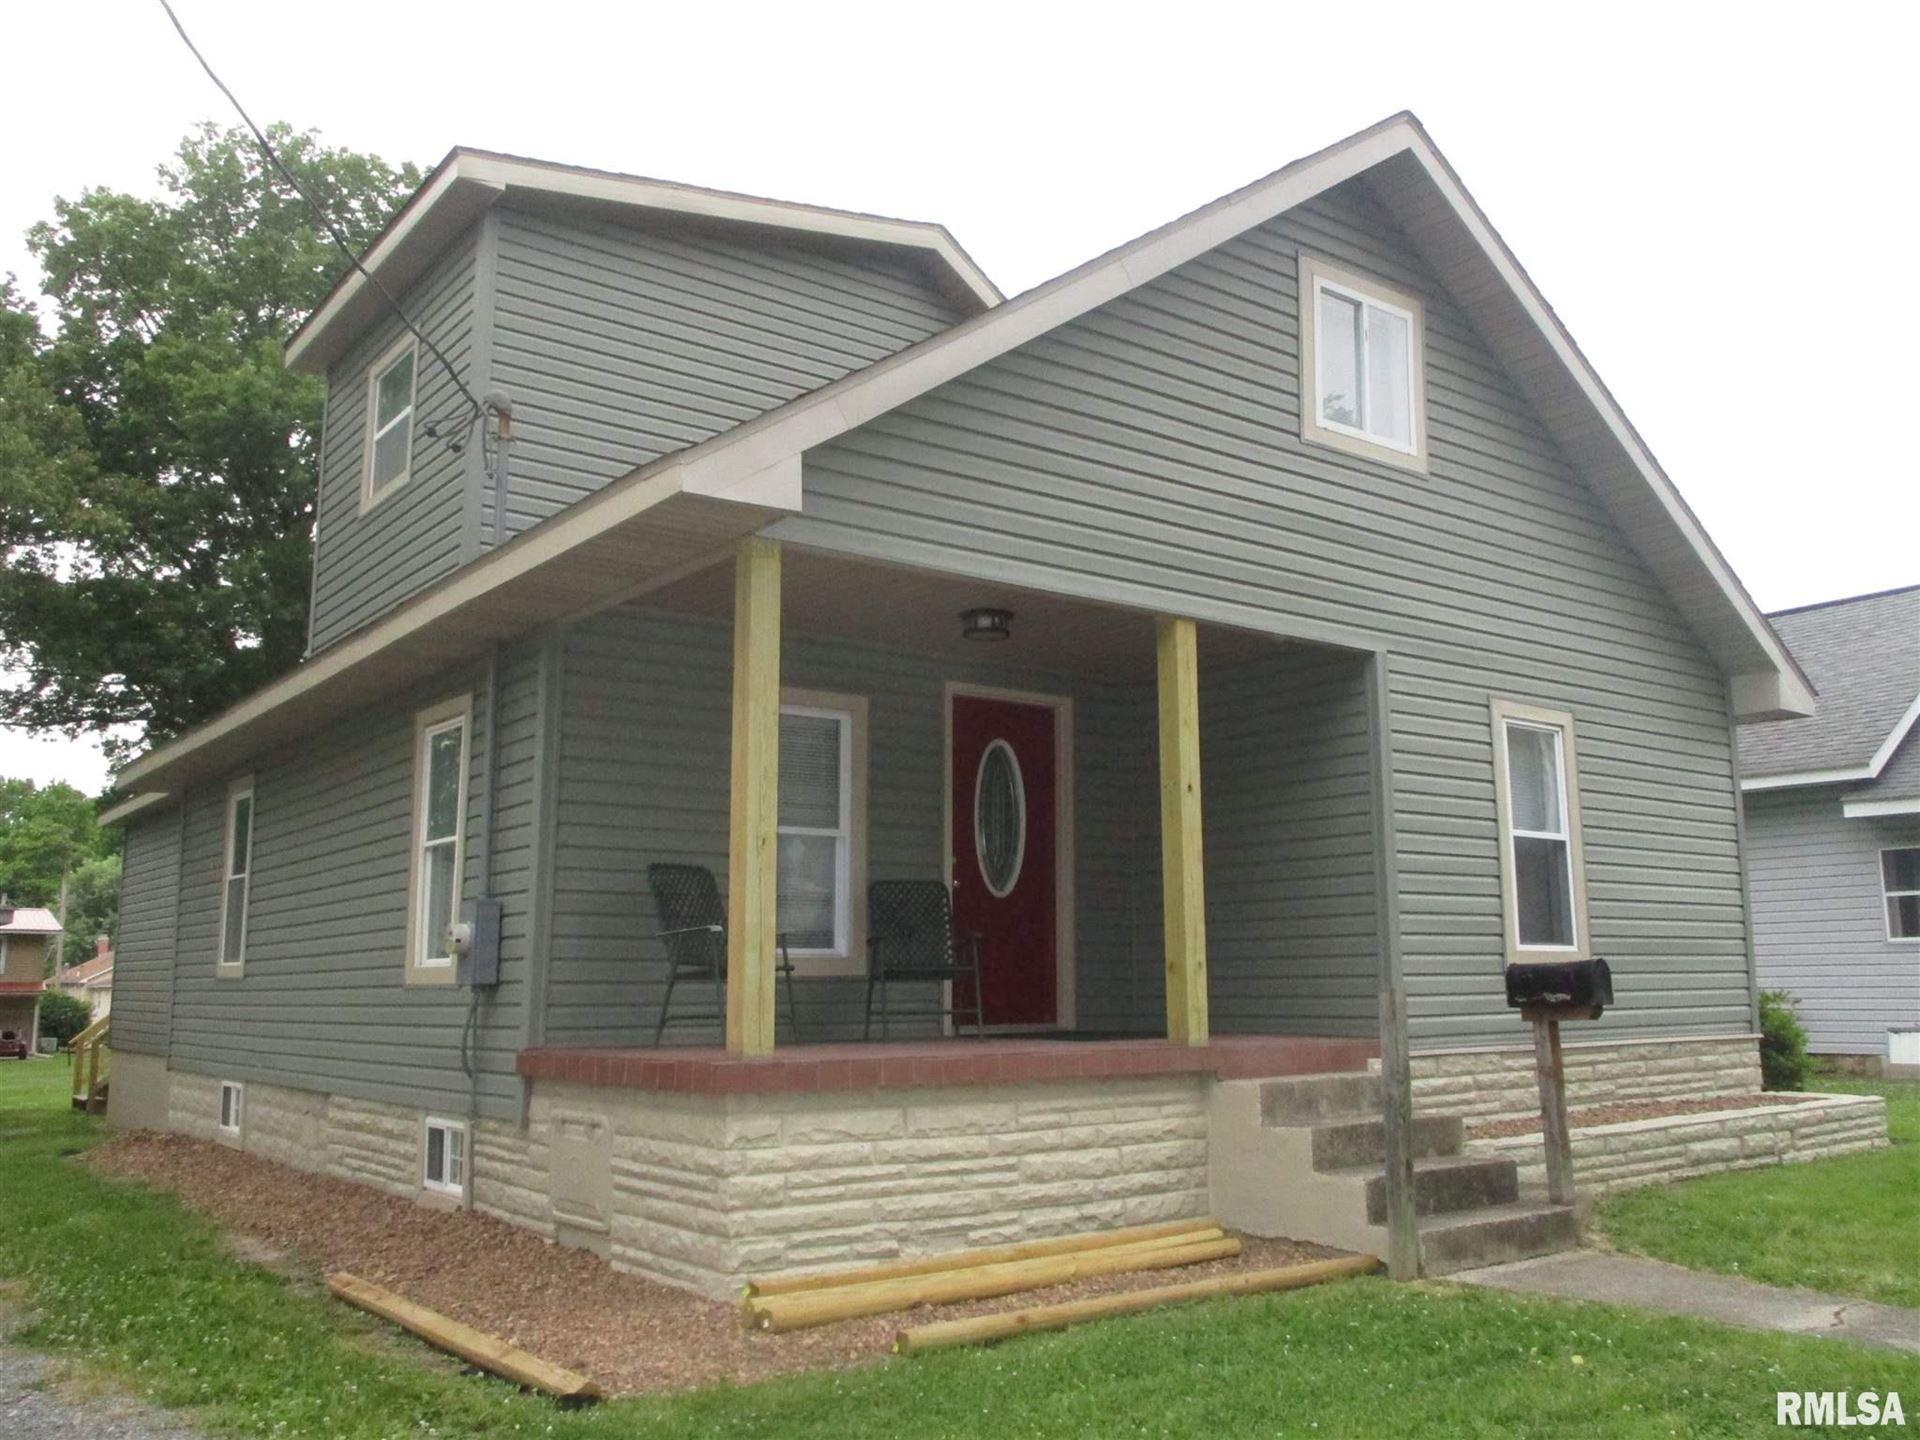 409 S Odle Street, West Frankfort, IL 62896 - MLS#: EB434578